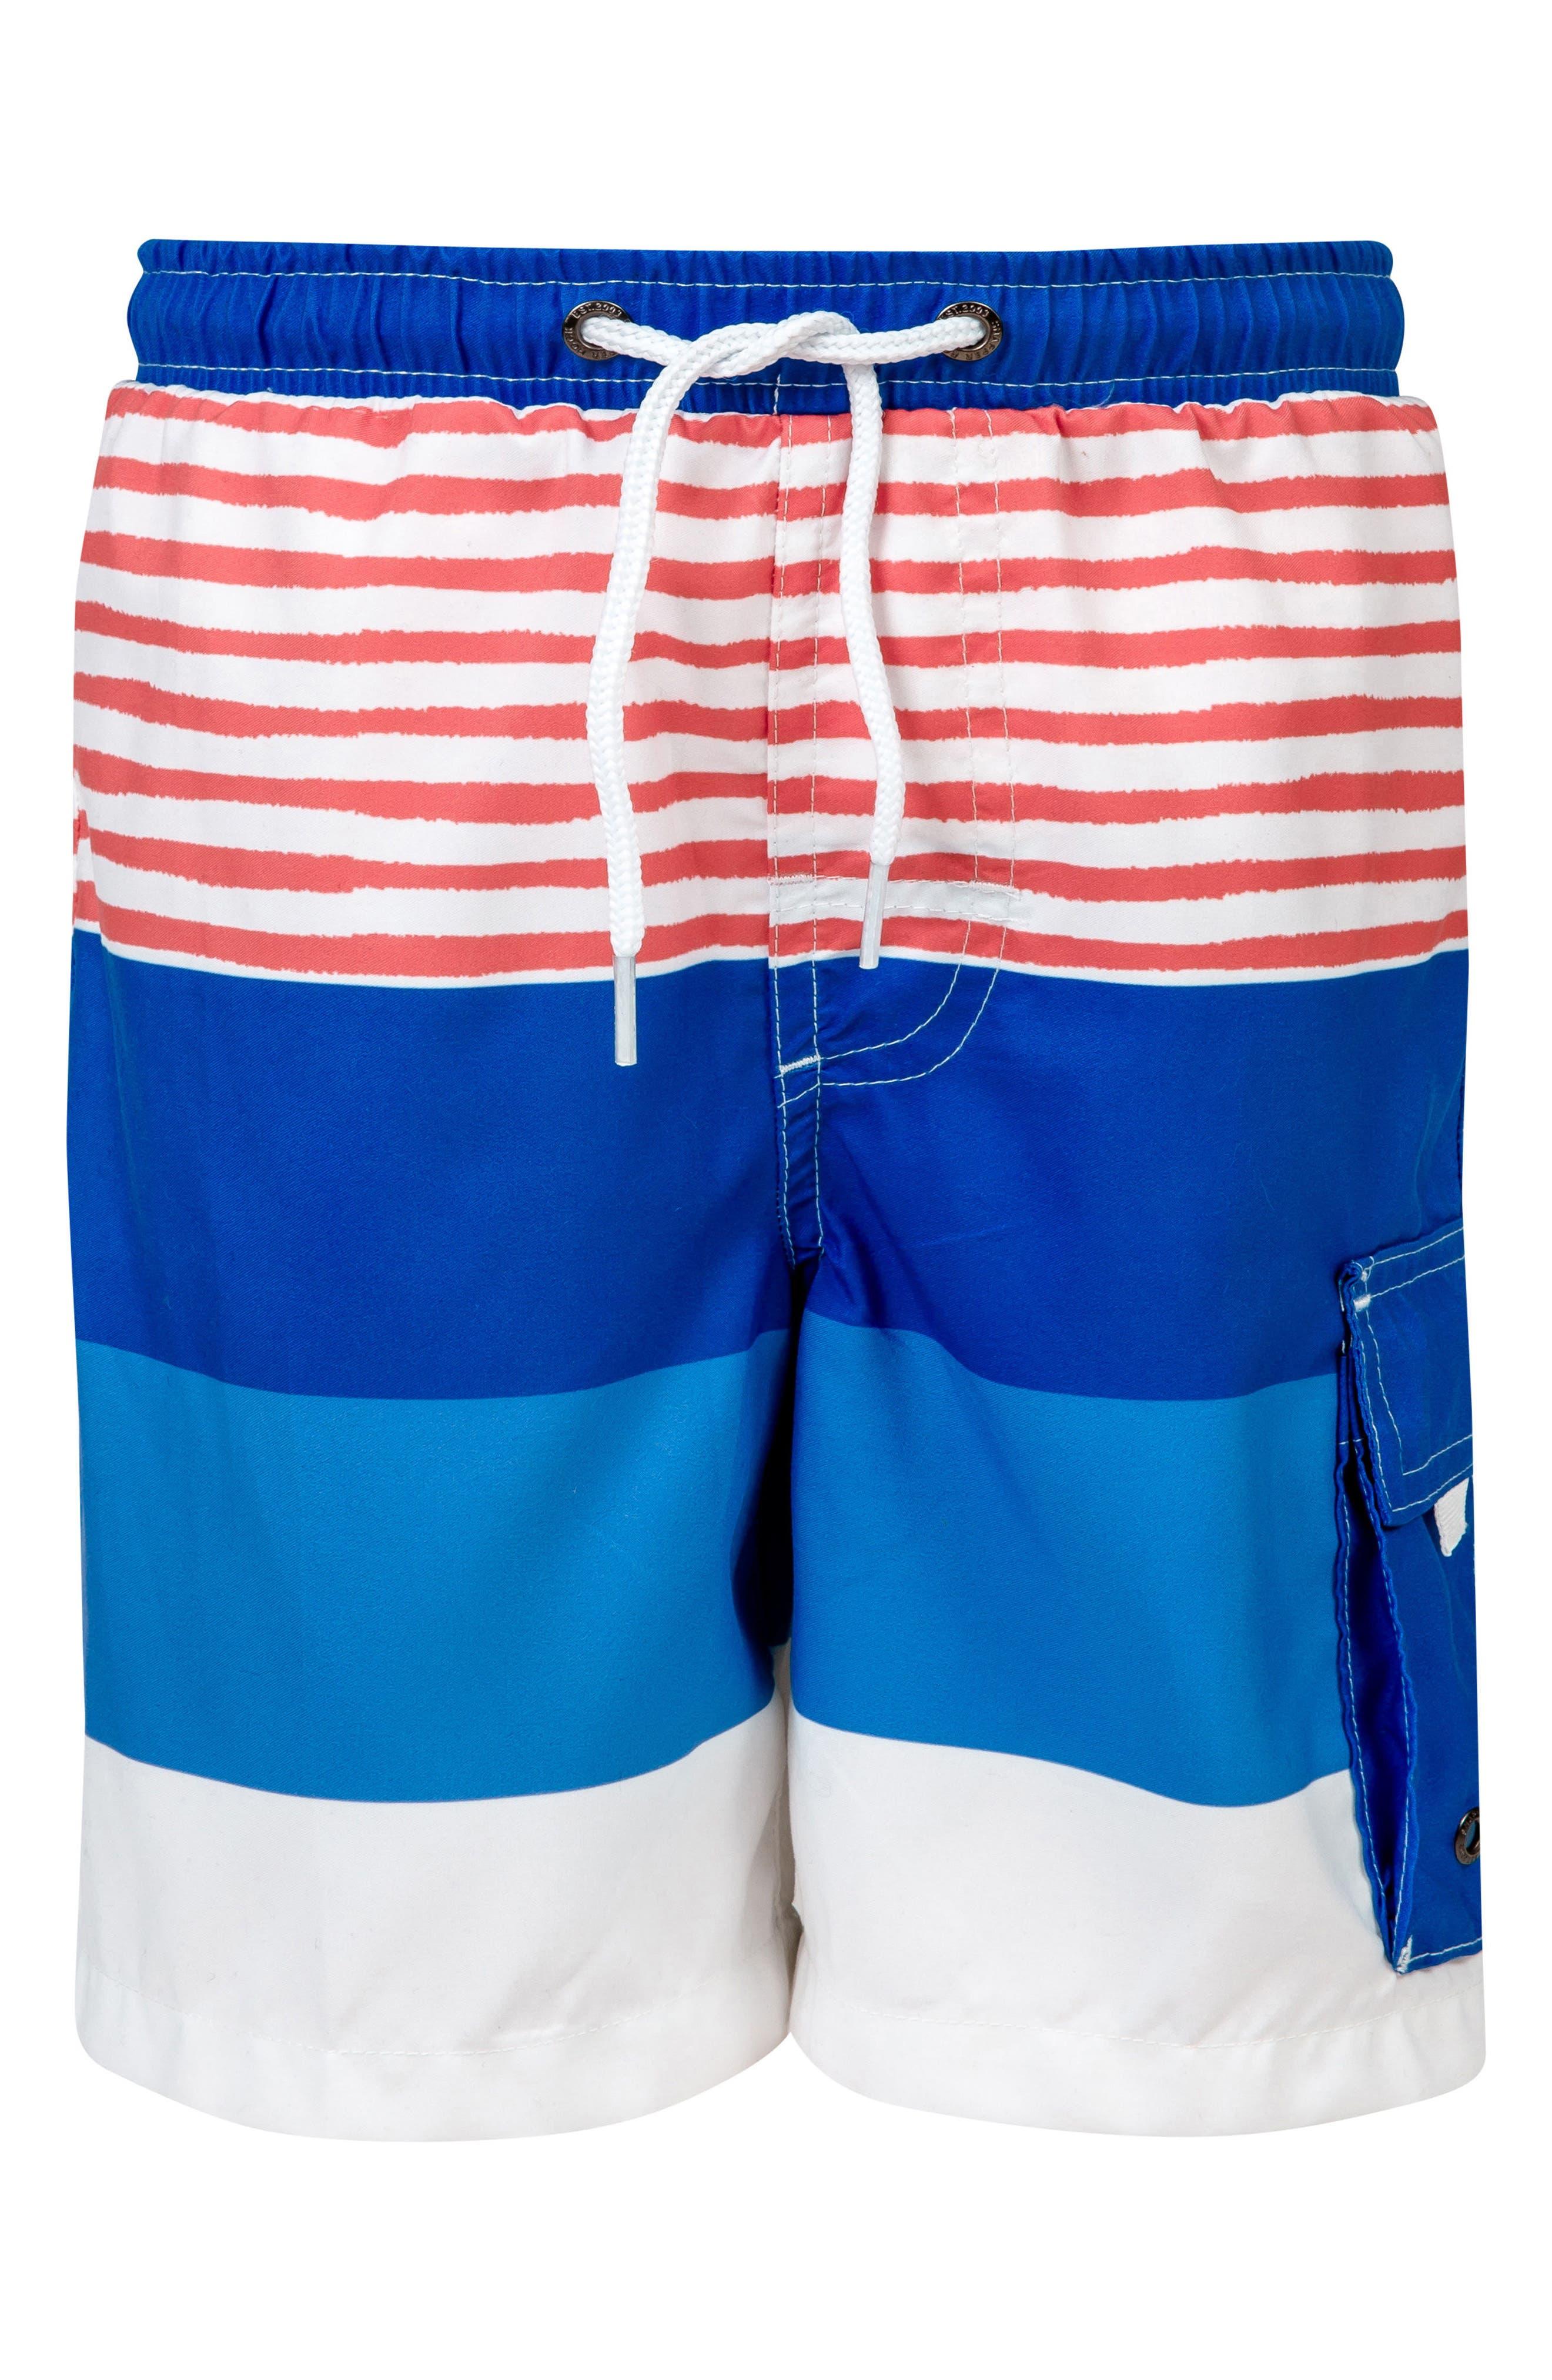 Sail Stripe Board Shorts,                         Main,                         color, ROYAL/ RED/ WHITE